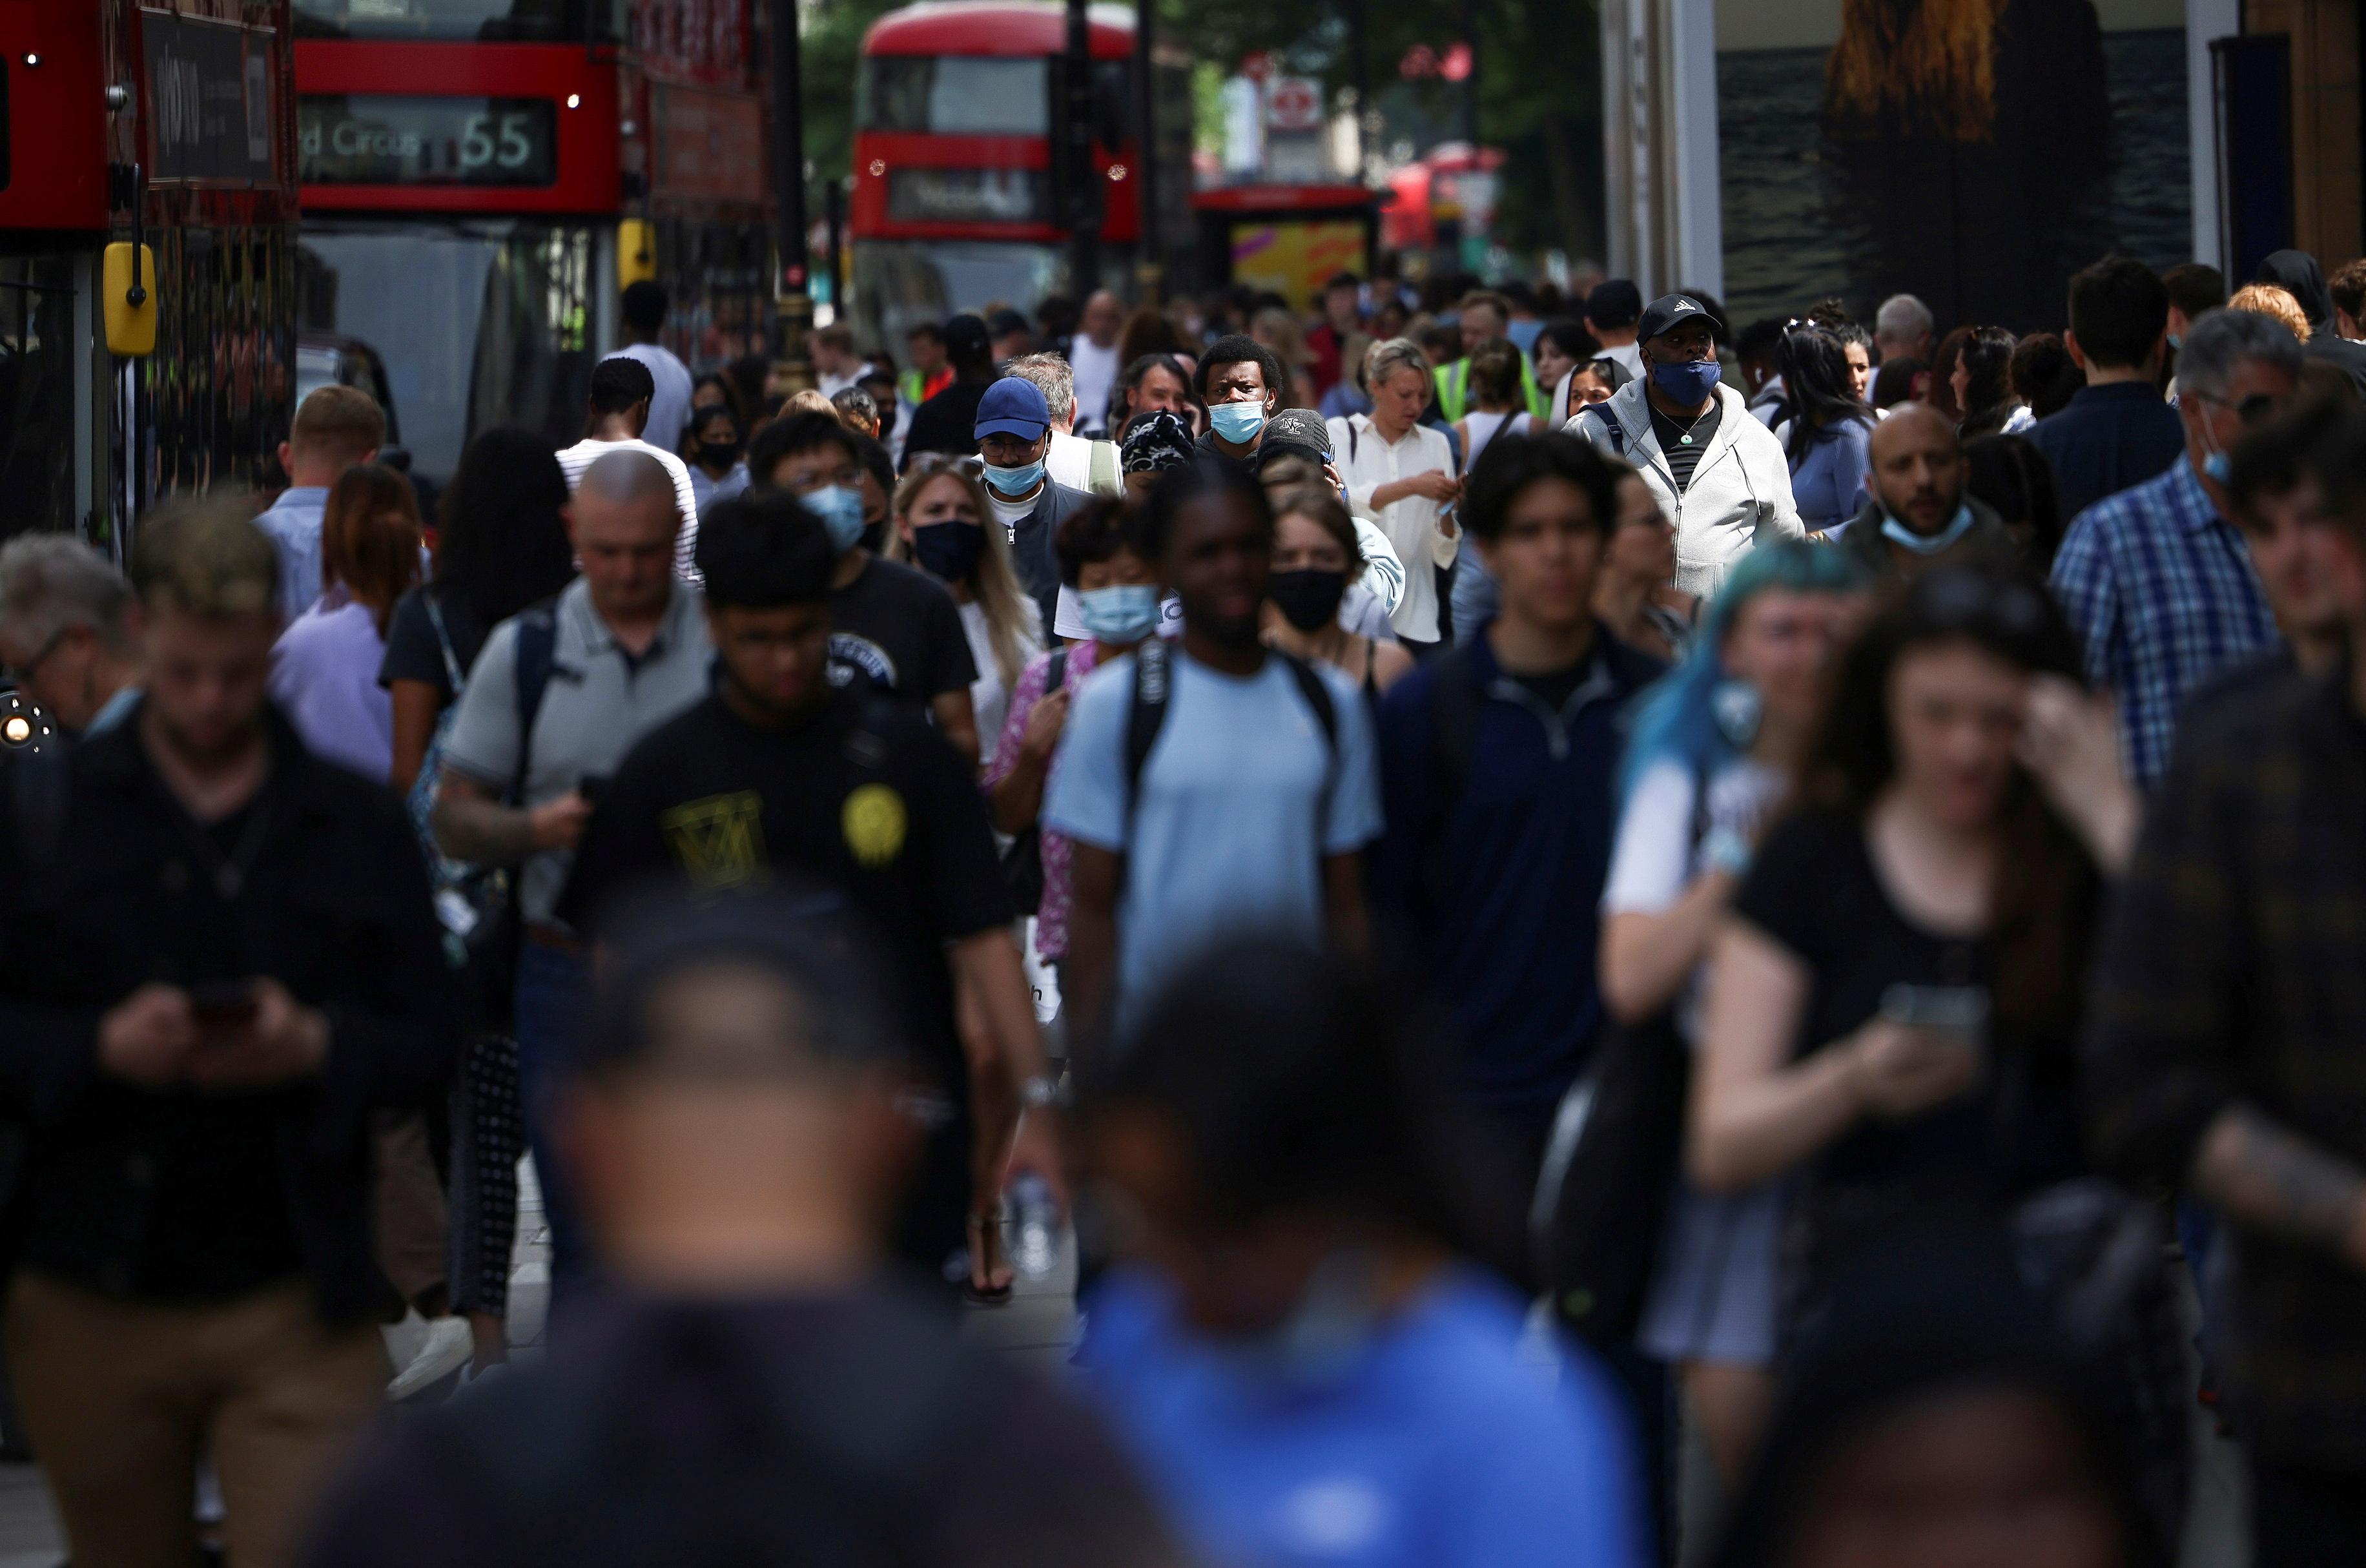 People walk along Oxford Street, amid the coronavirus disease (COVID-19) outbreak, in London, Britain, July 26, 2021. REUTERS/Henry Nicholls